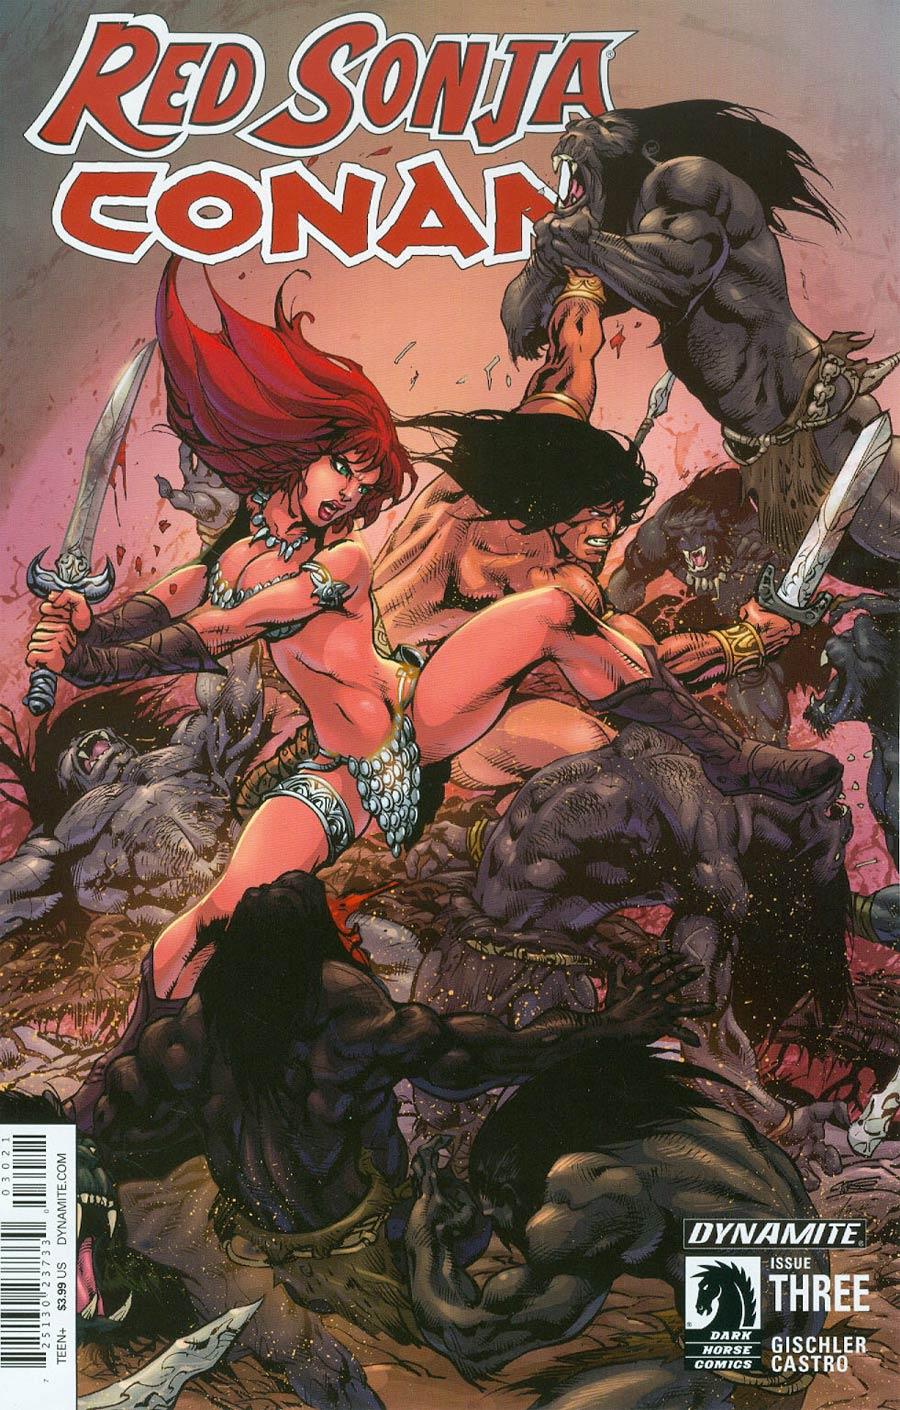 Red Sonja Conan #3 Cover B Variant Roberto Castro Subscription Cover